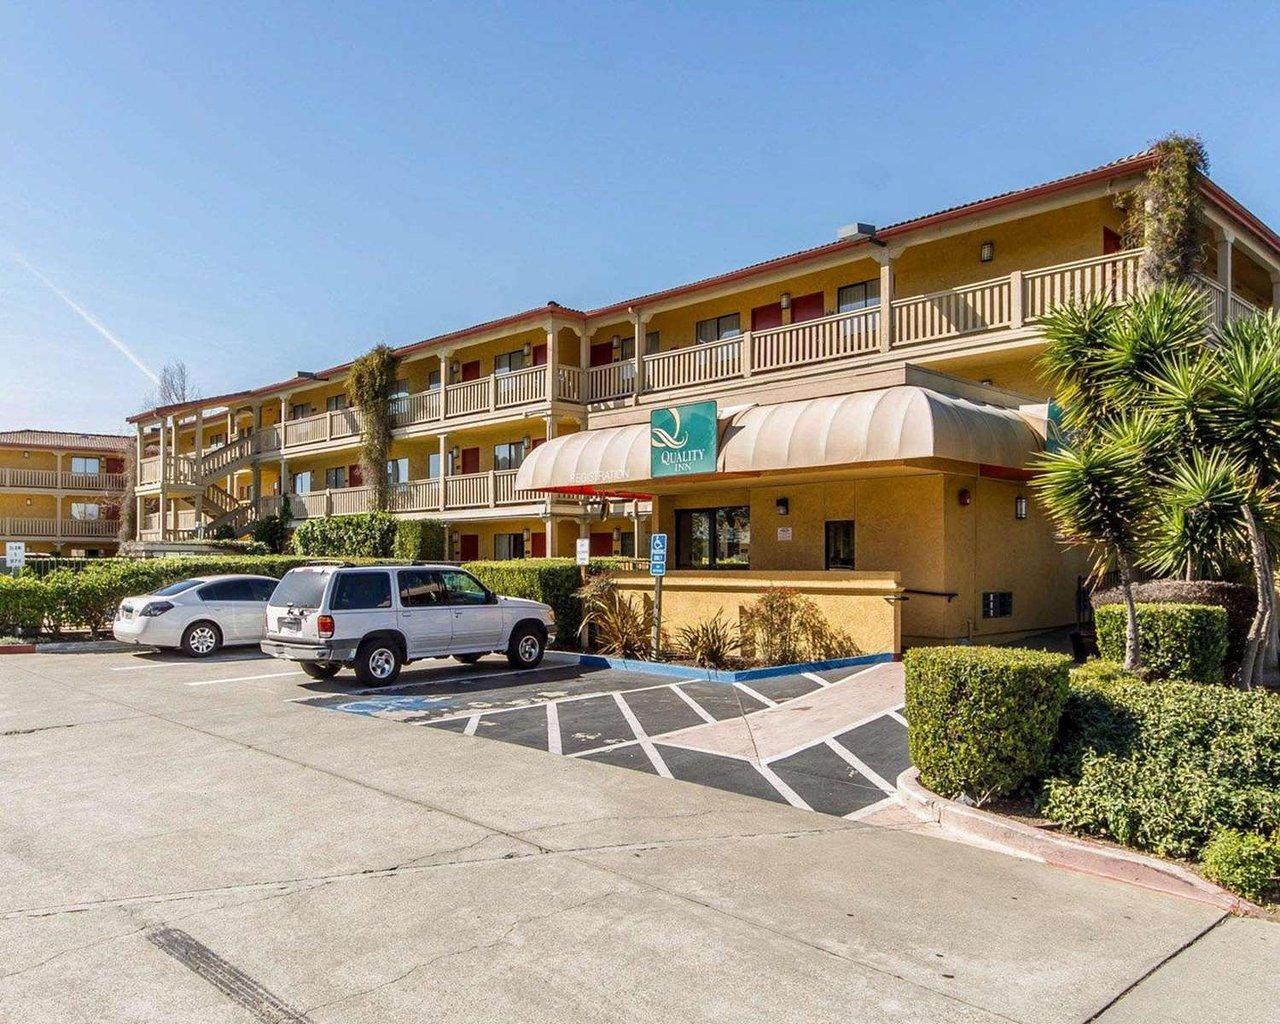 Quality Inn Oakland Hotel